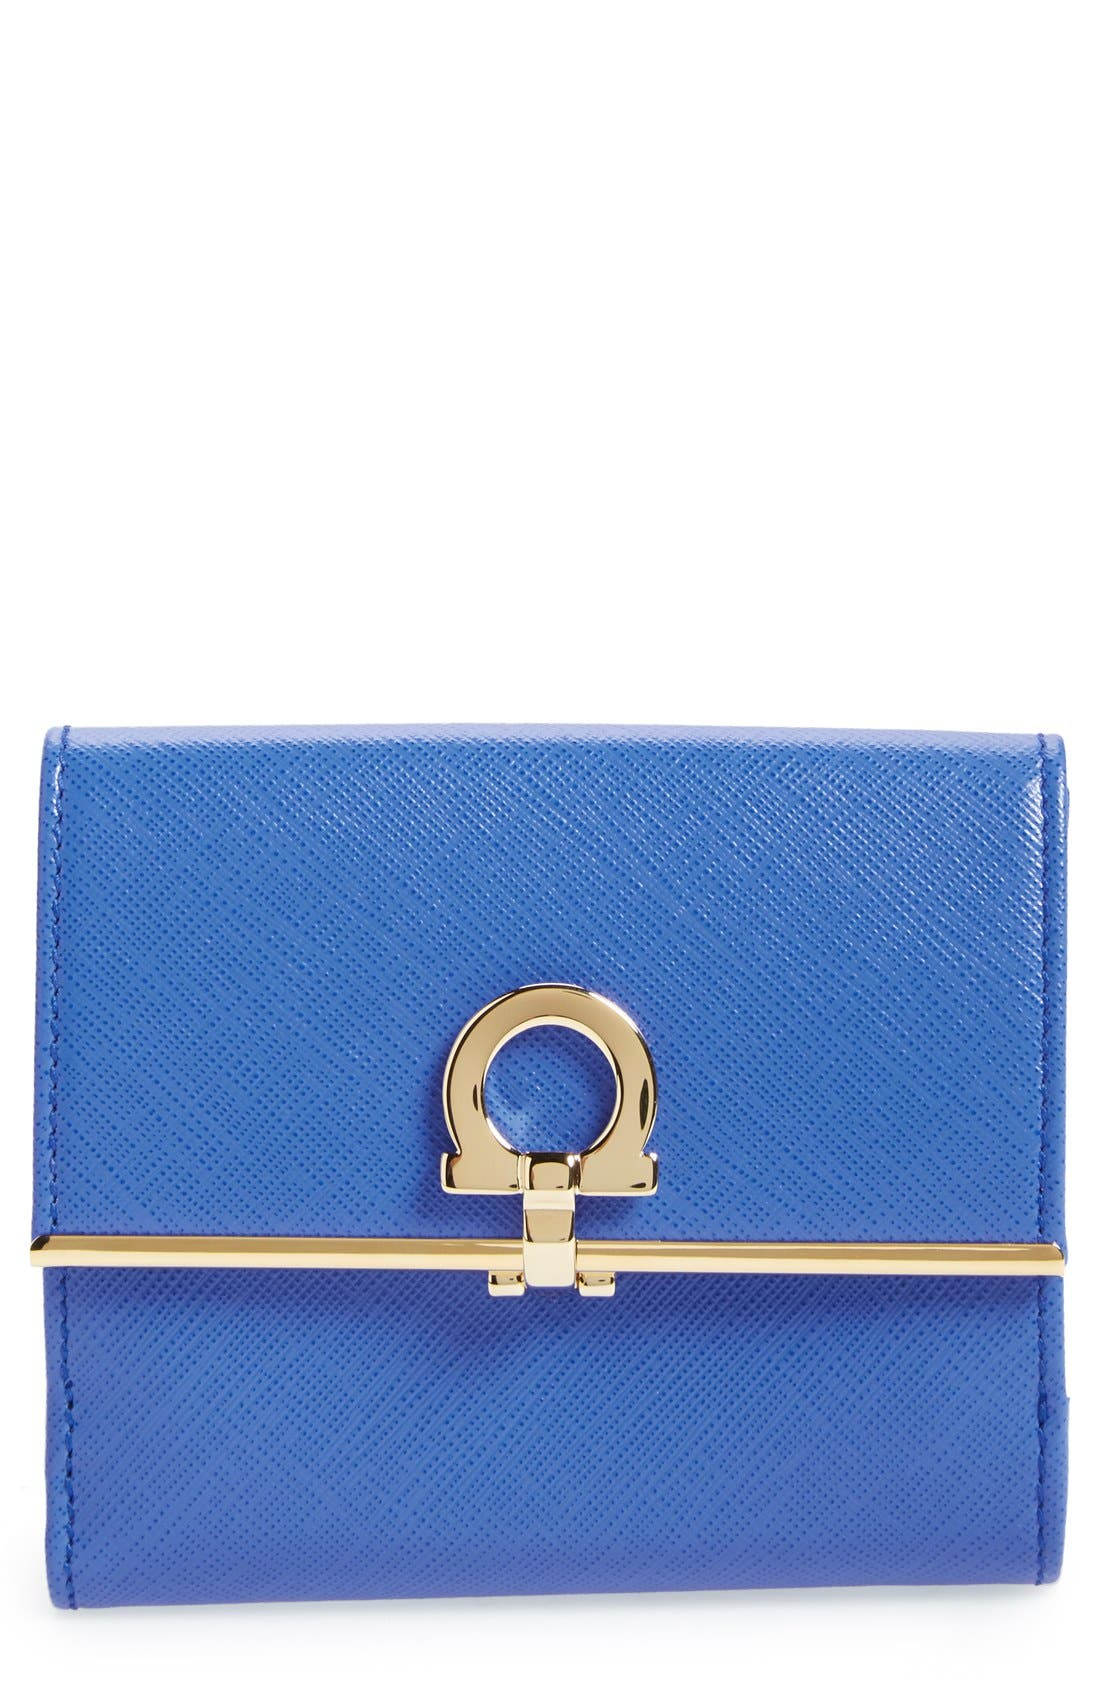 Main Image - Salvatore Ferragamo Saffiano Calfskin Leather Wallet